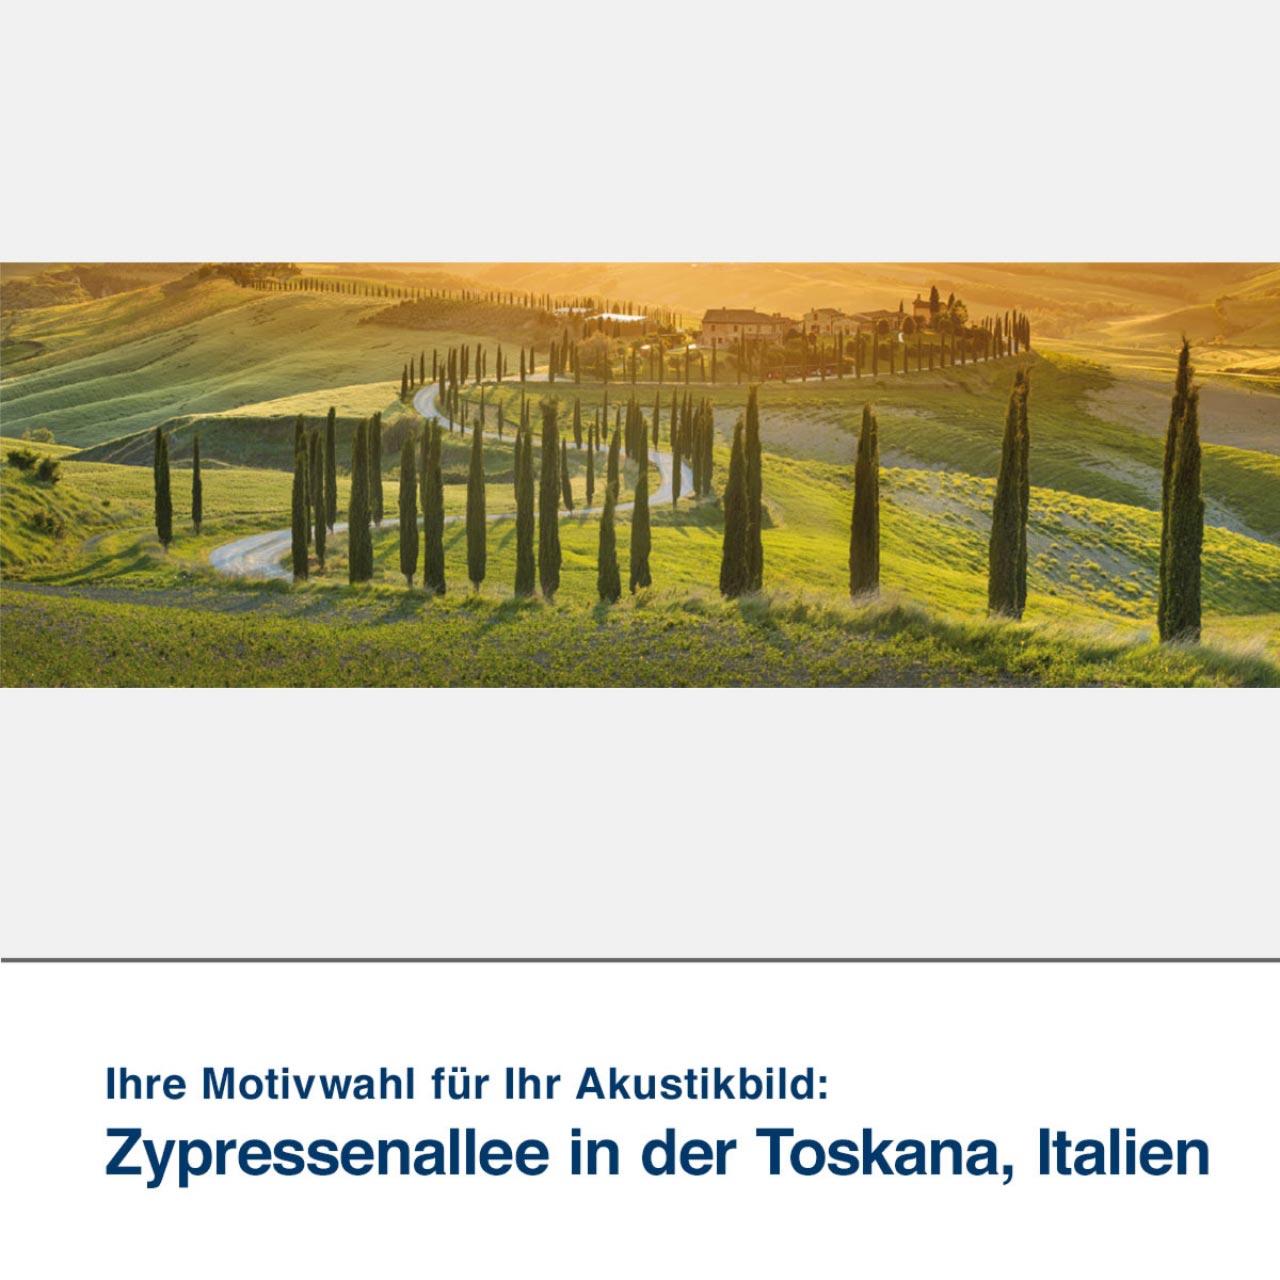 Akustikbild Motiv Zypressenallee in der Toskana, Italien